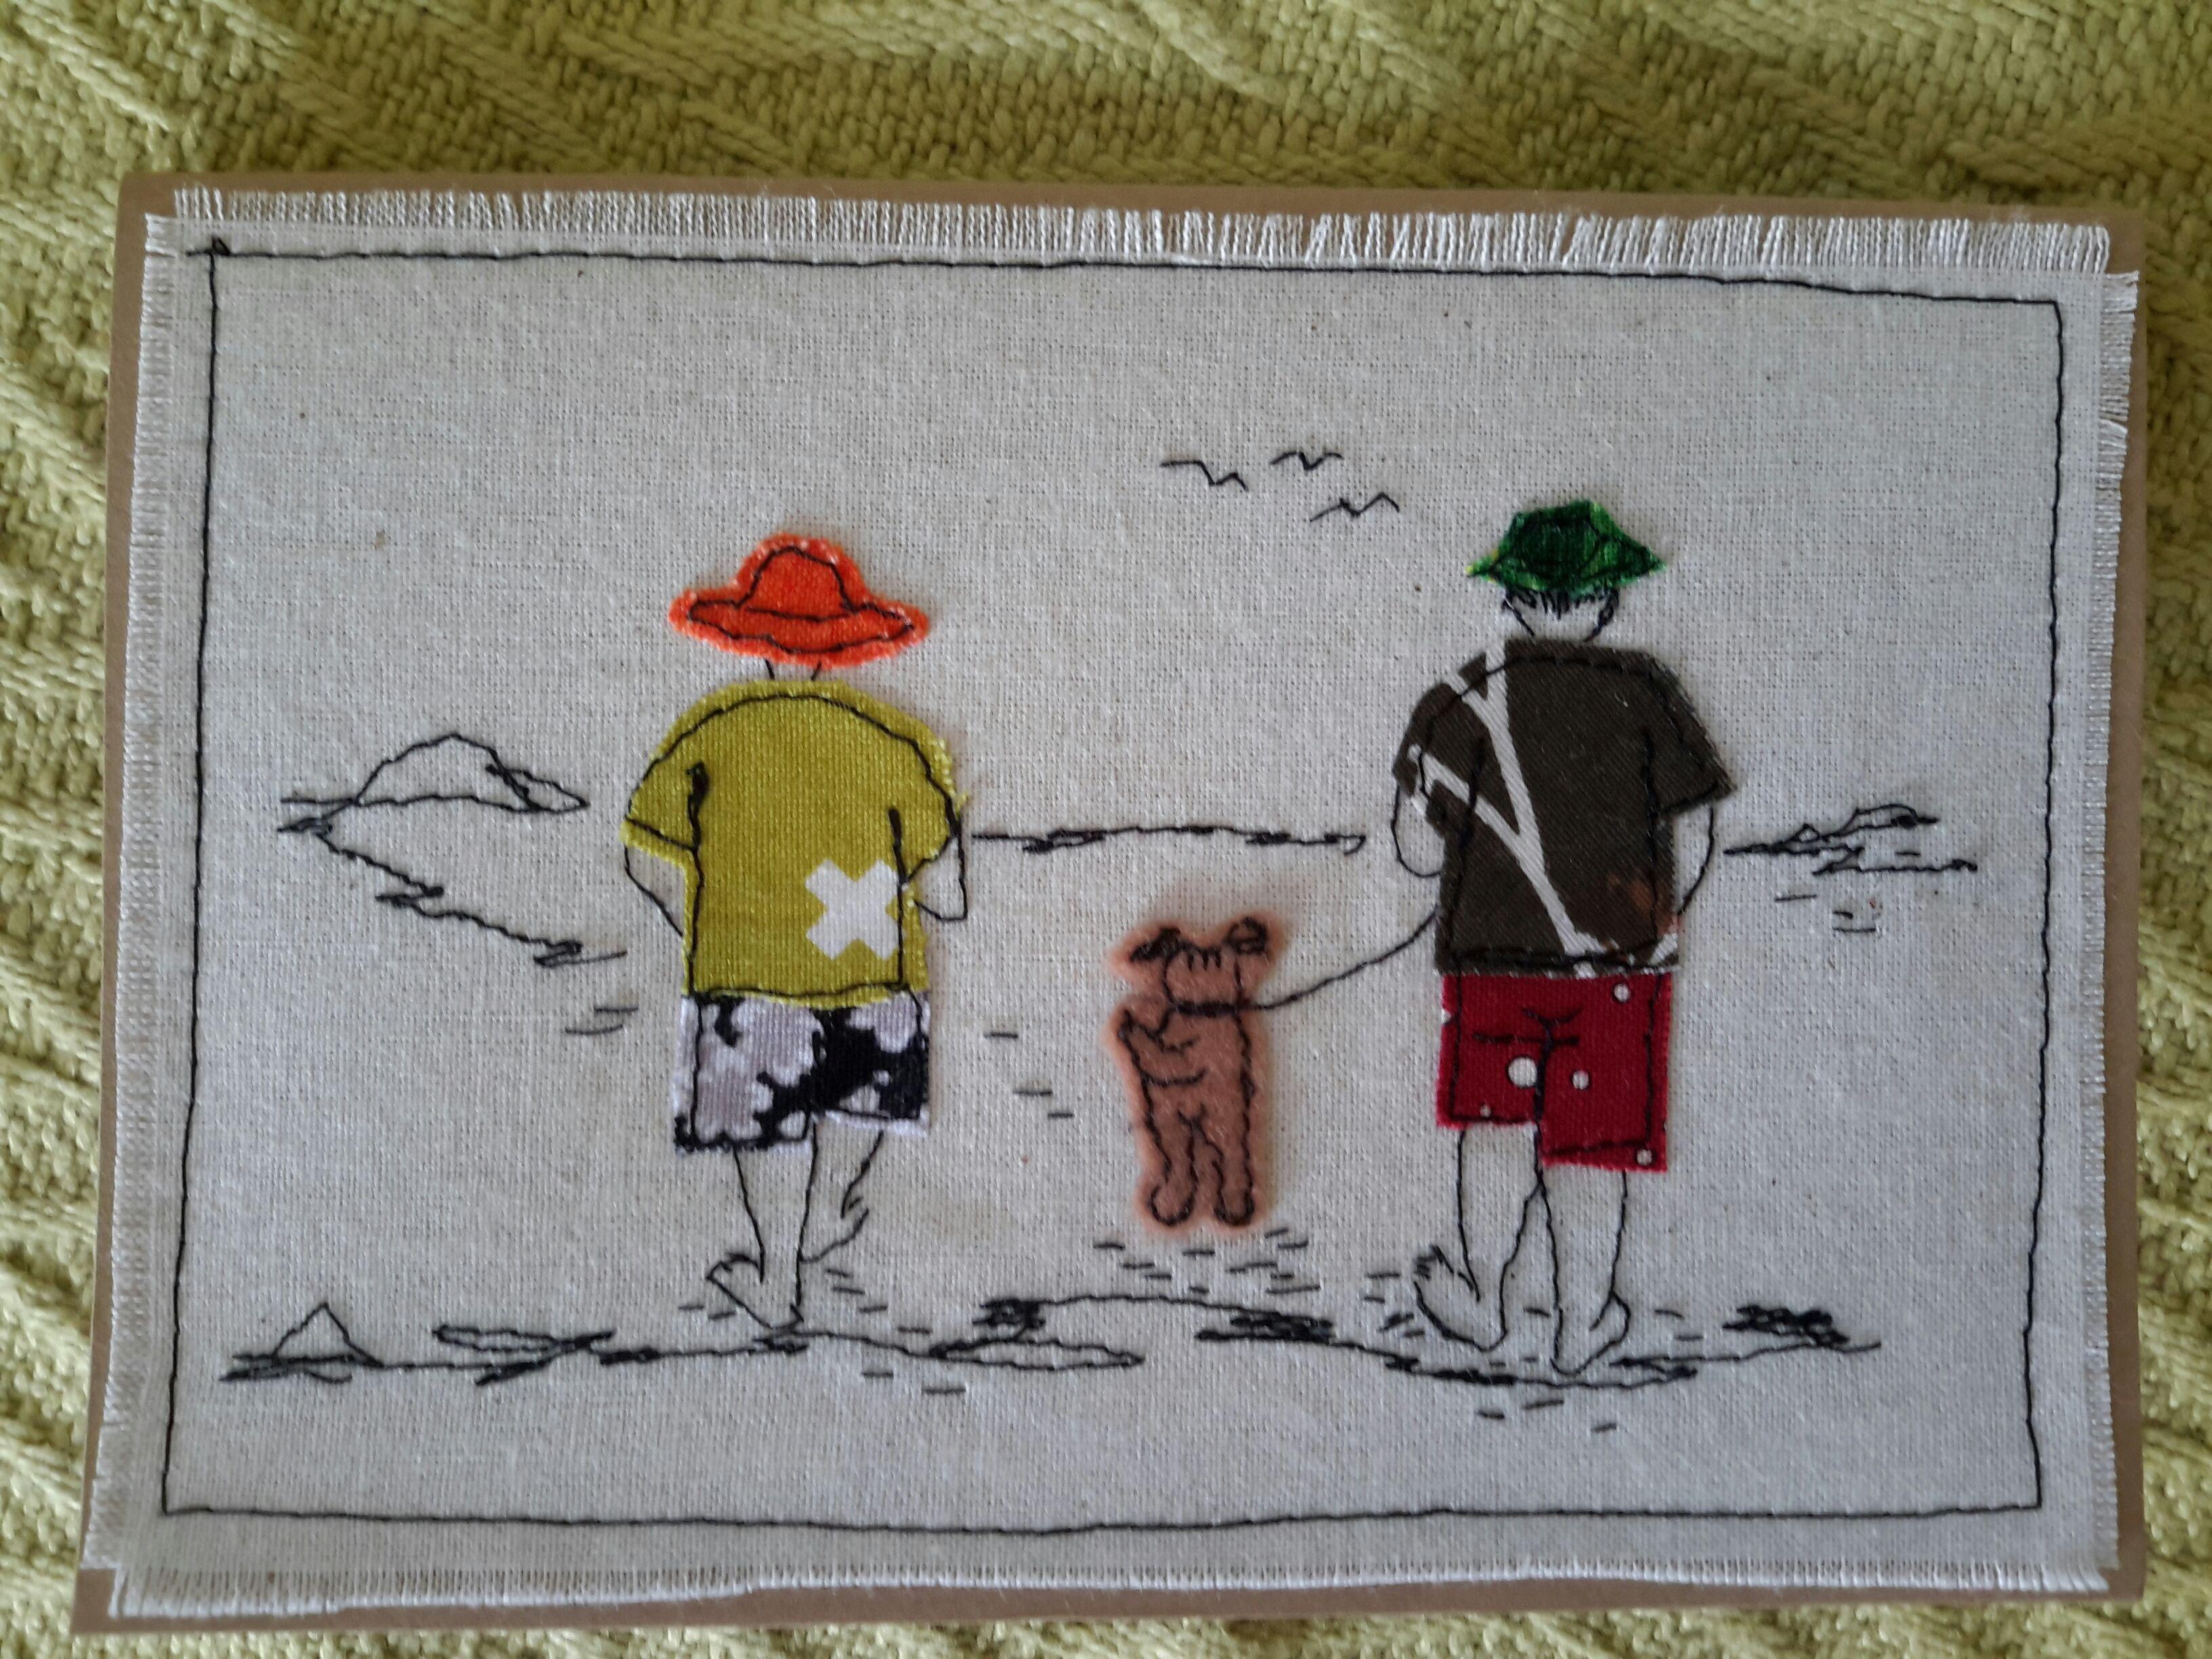 Pin by Krystyna Fikus on Postcard | Pinterest | Embroidery, Machine ...